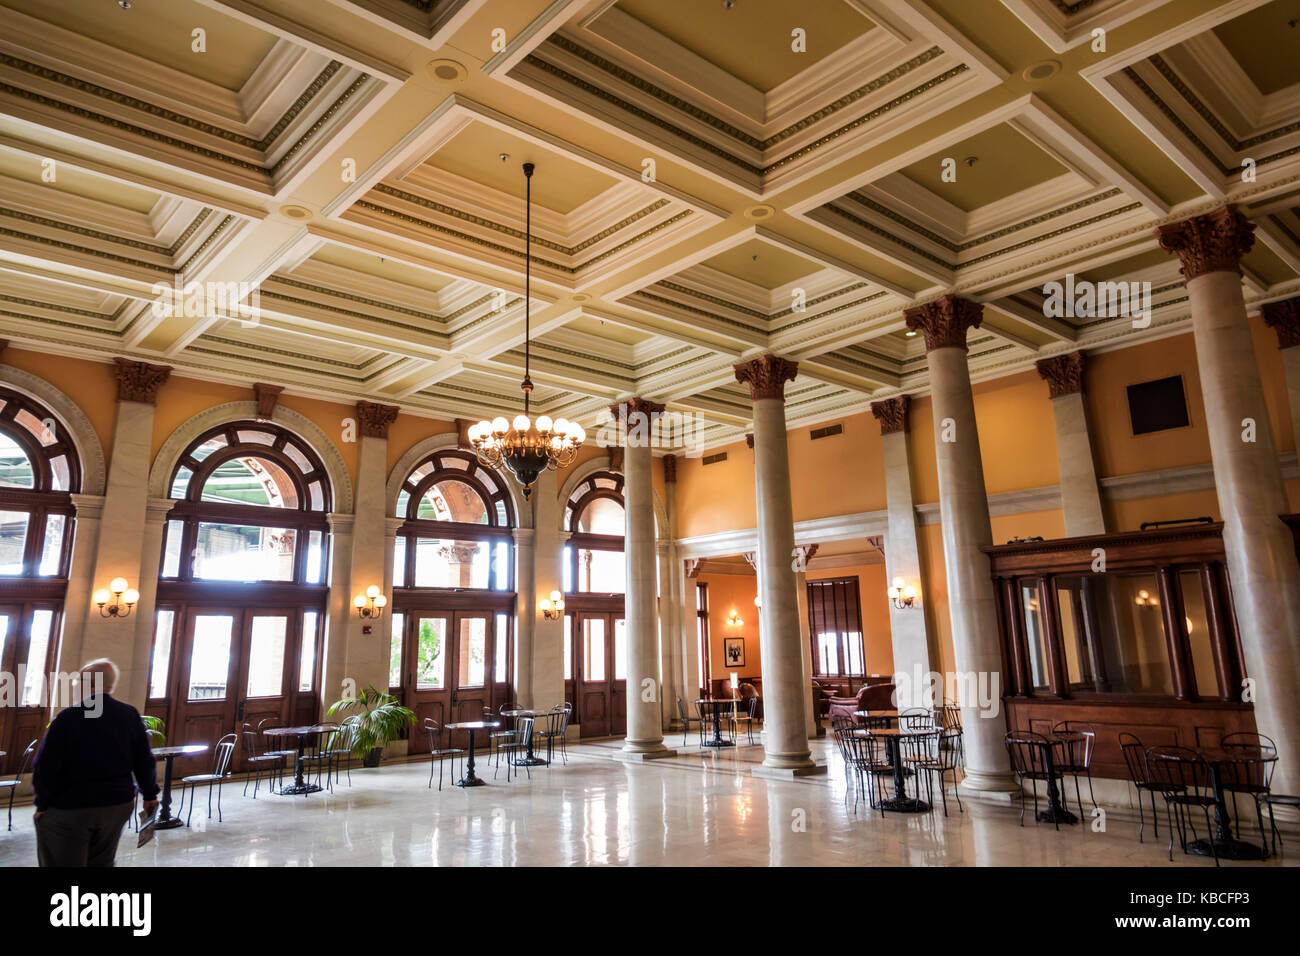 Richmond Virginia Main Street Station historic railway train station interior - Stock Image